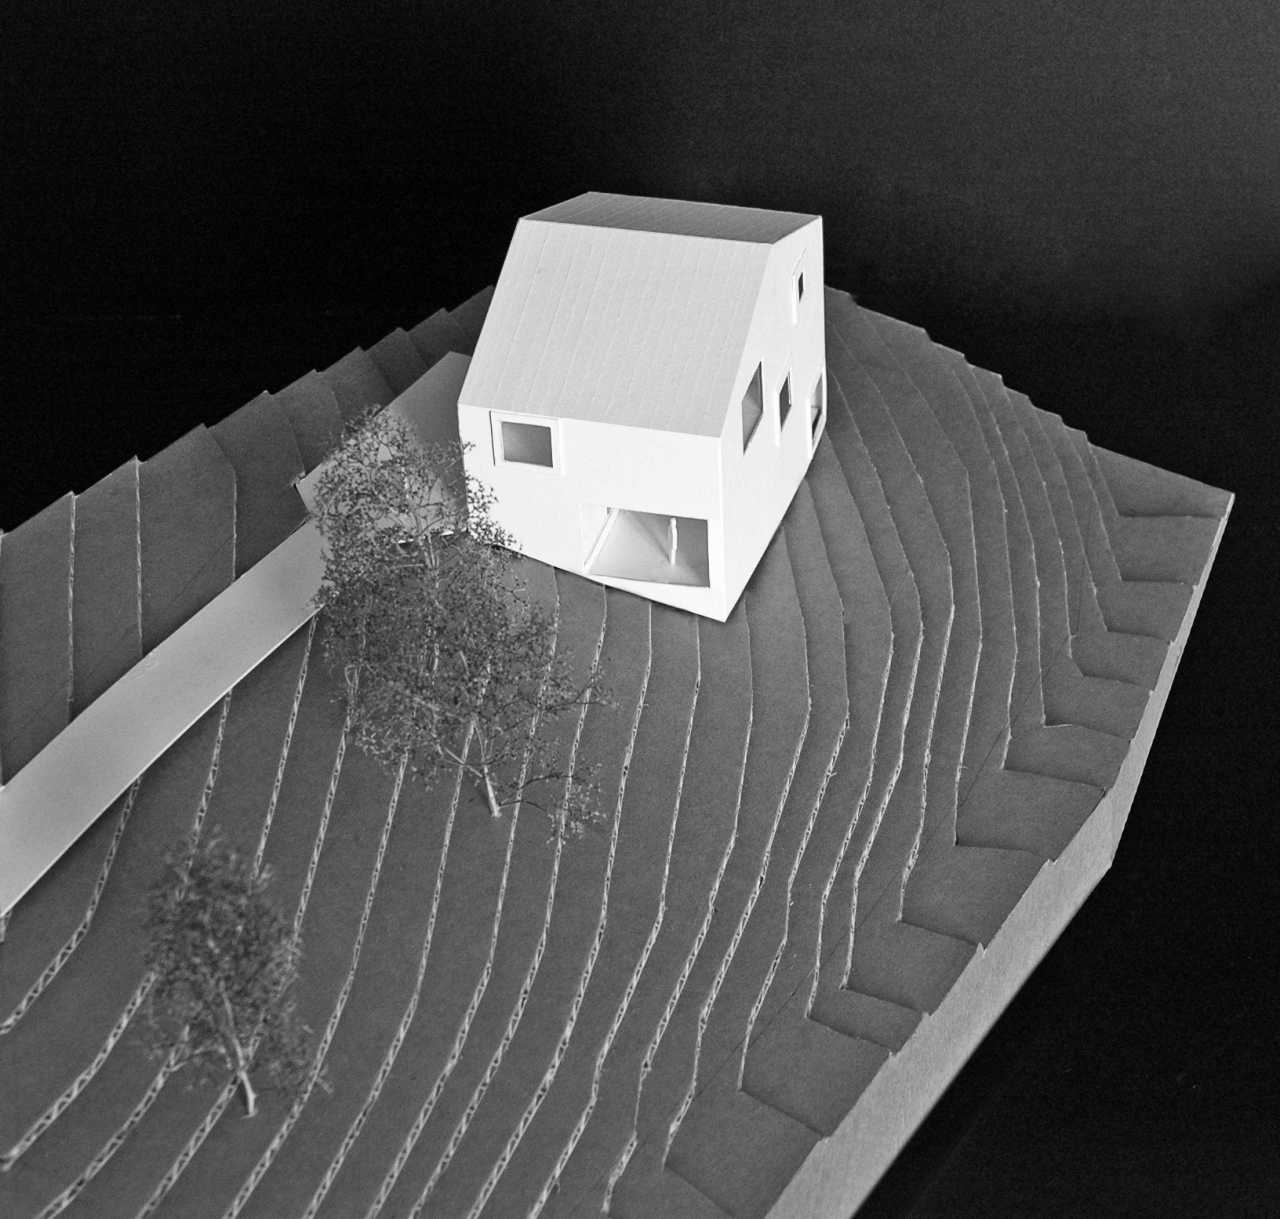 Haus Fontanella Bernardo Bader Architects Fontanella Austria 2013 architecture